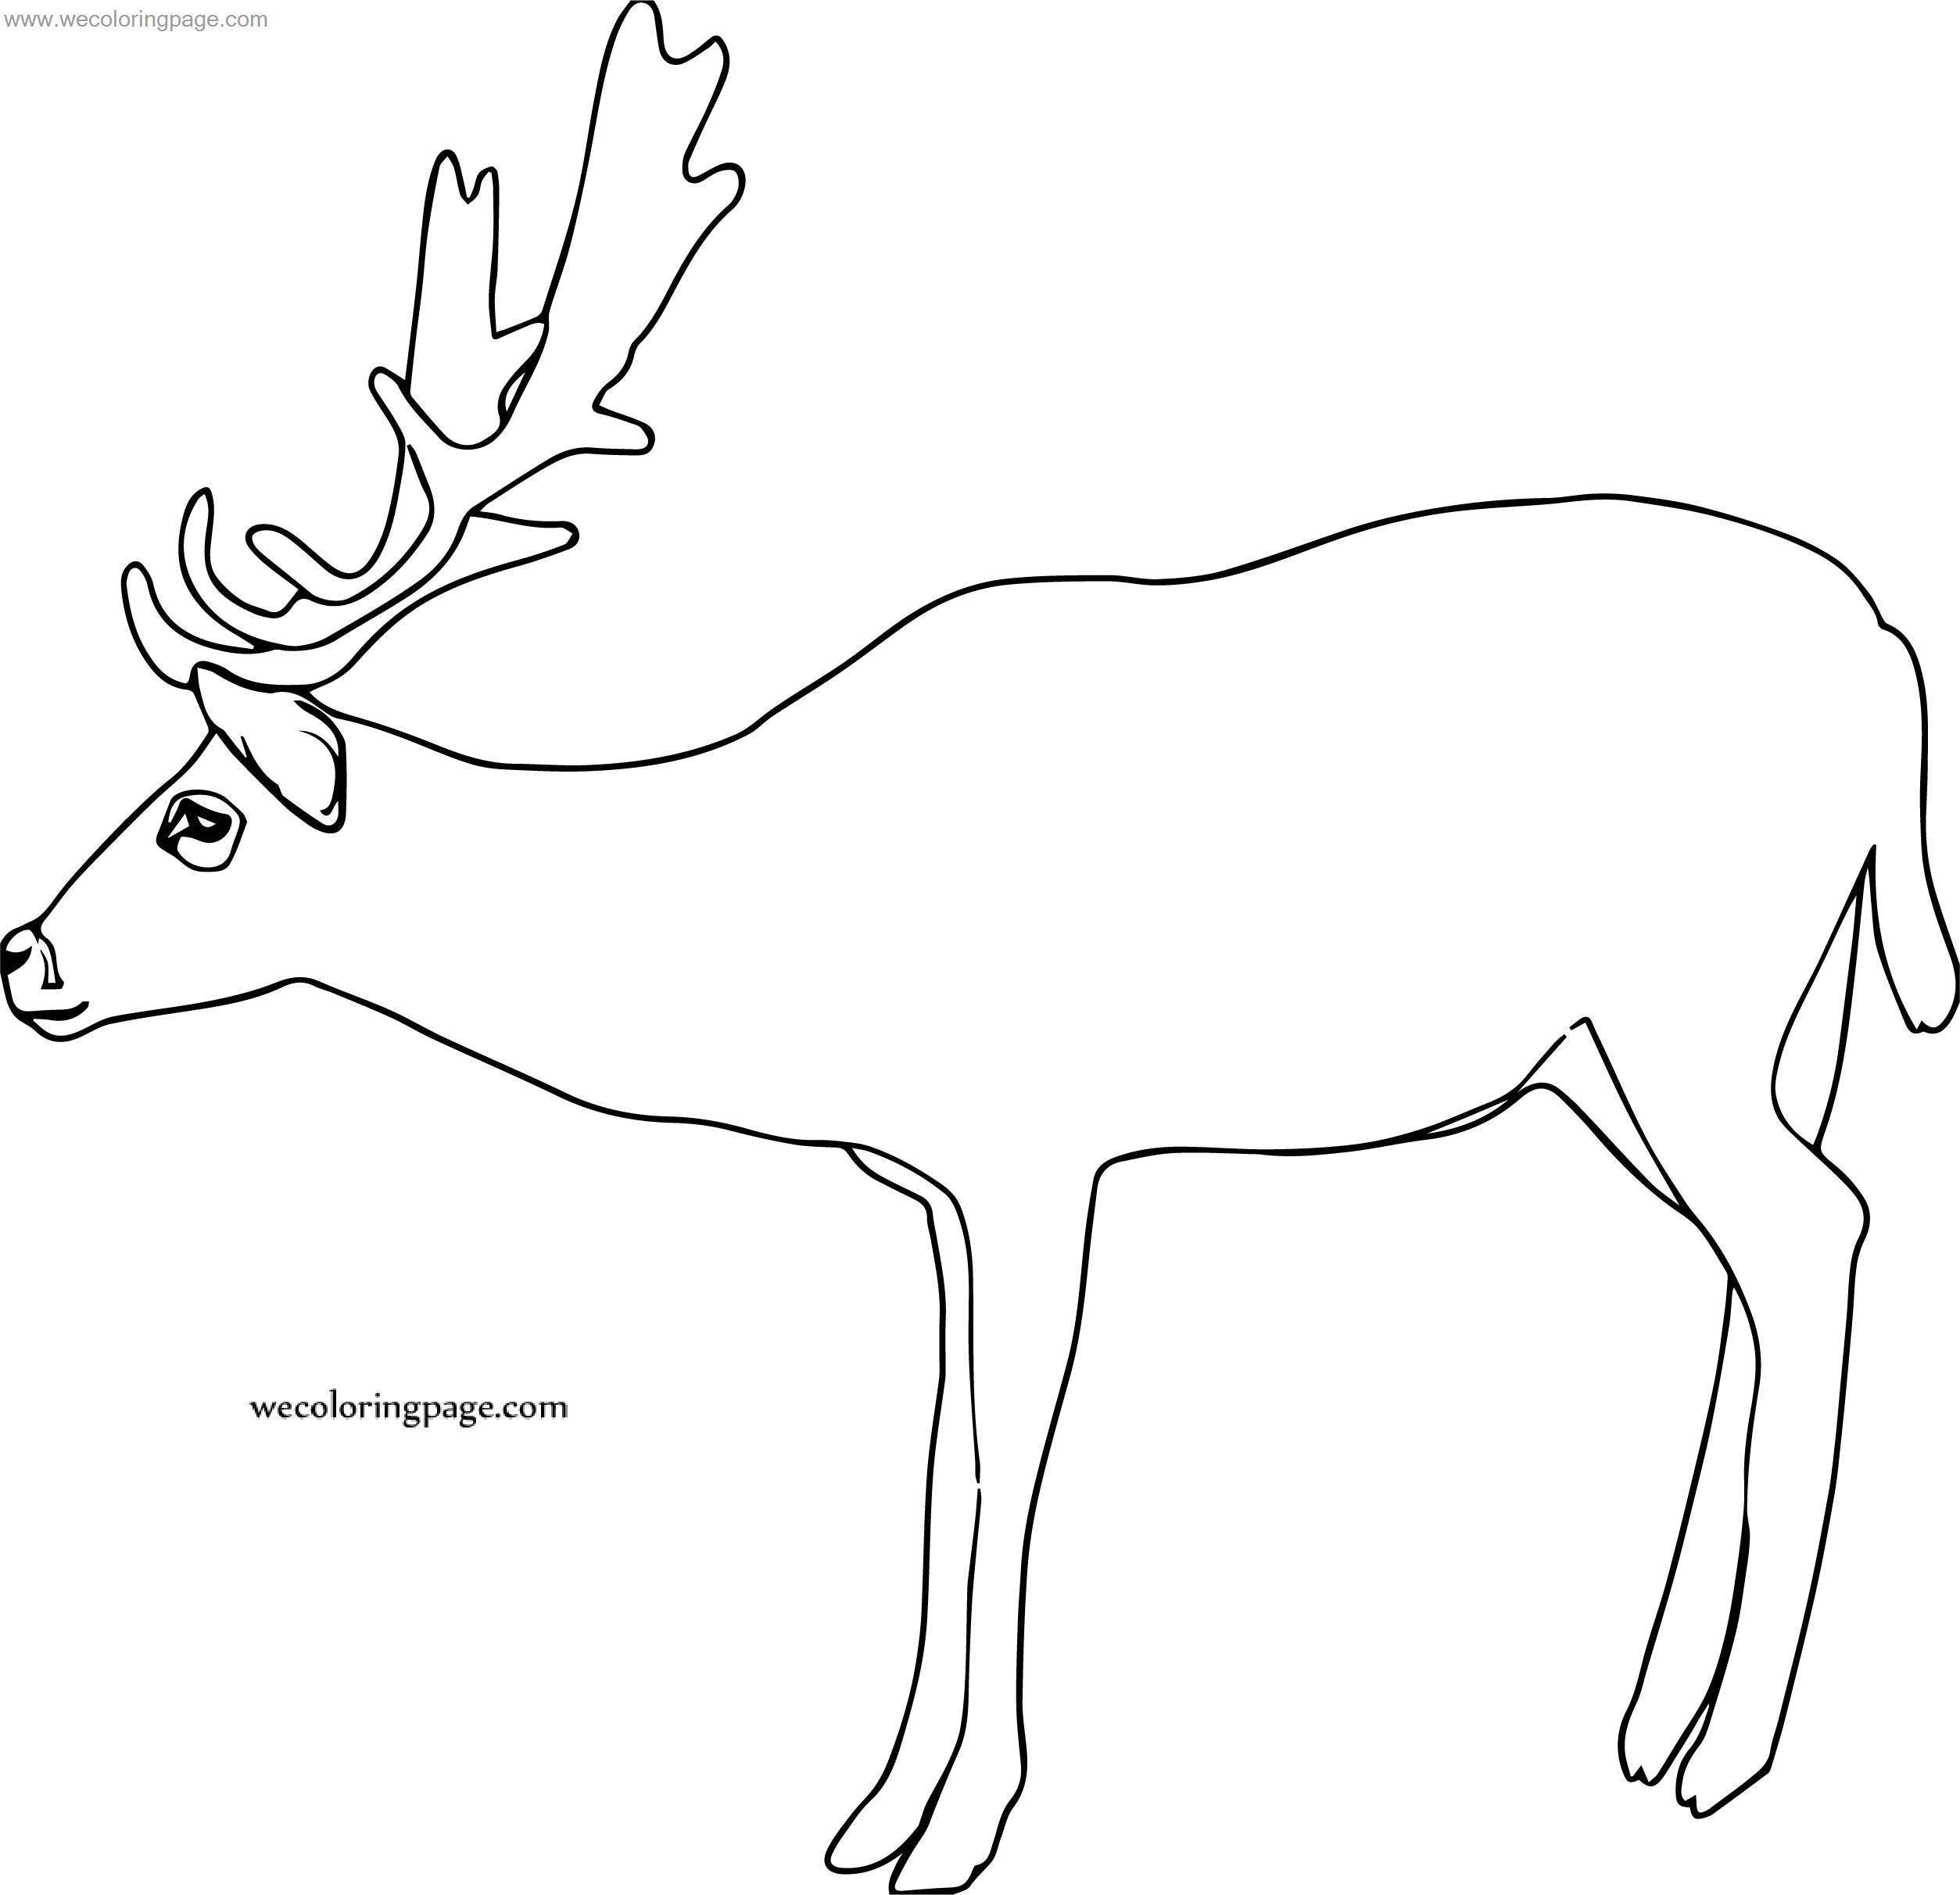 Original Deer Coloring Page